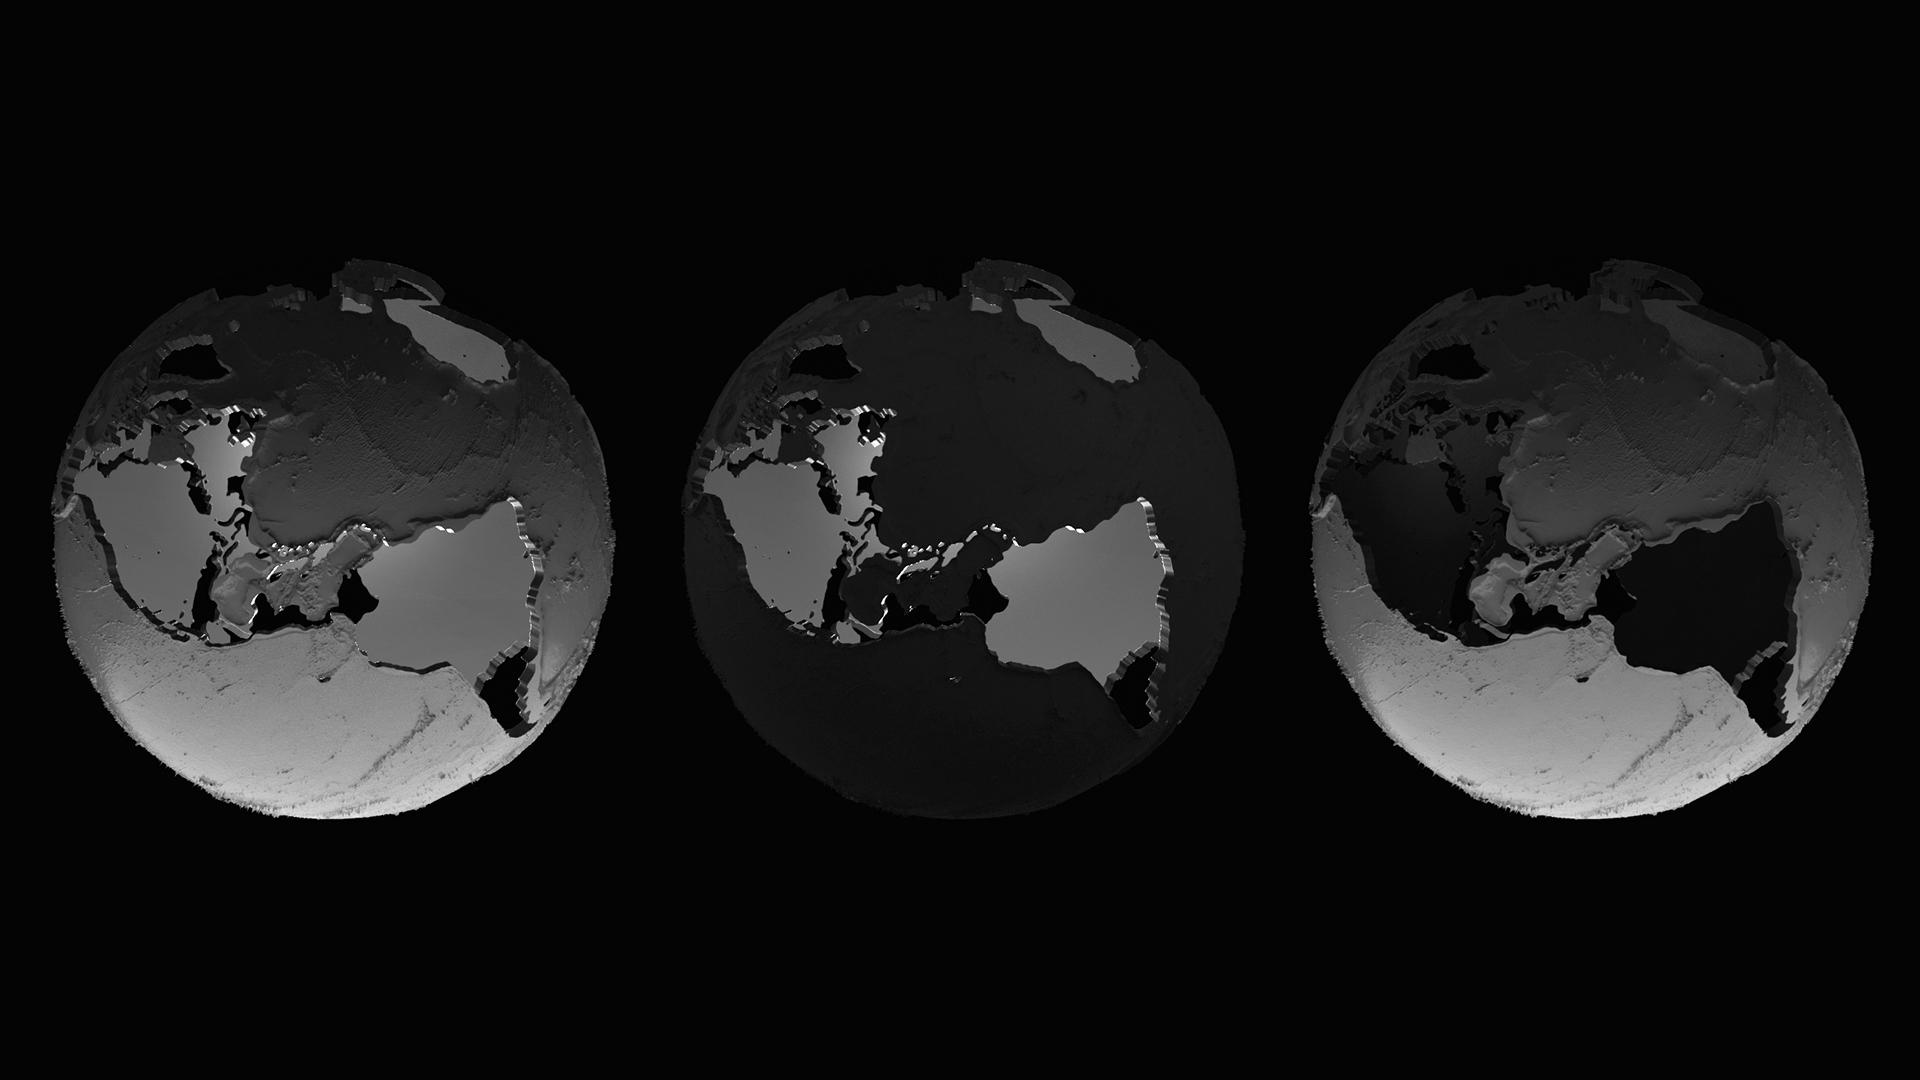 Ian-Nakamoto-Globe-lighting-options-previs-render-greyscale-3-viewsjpg